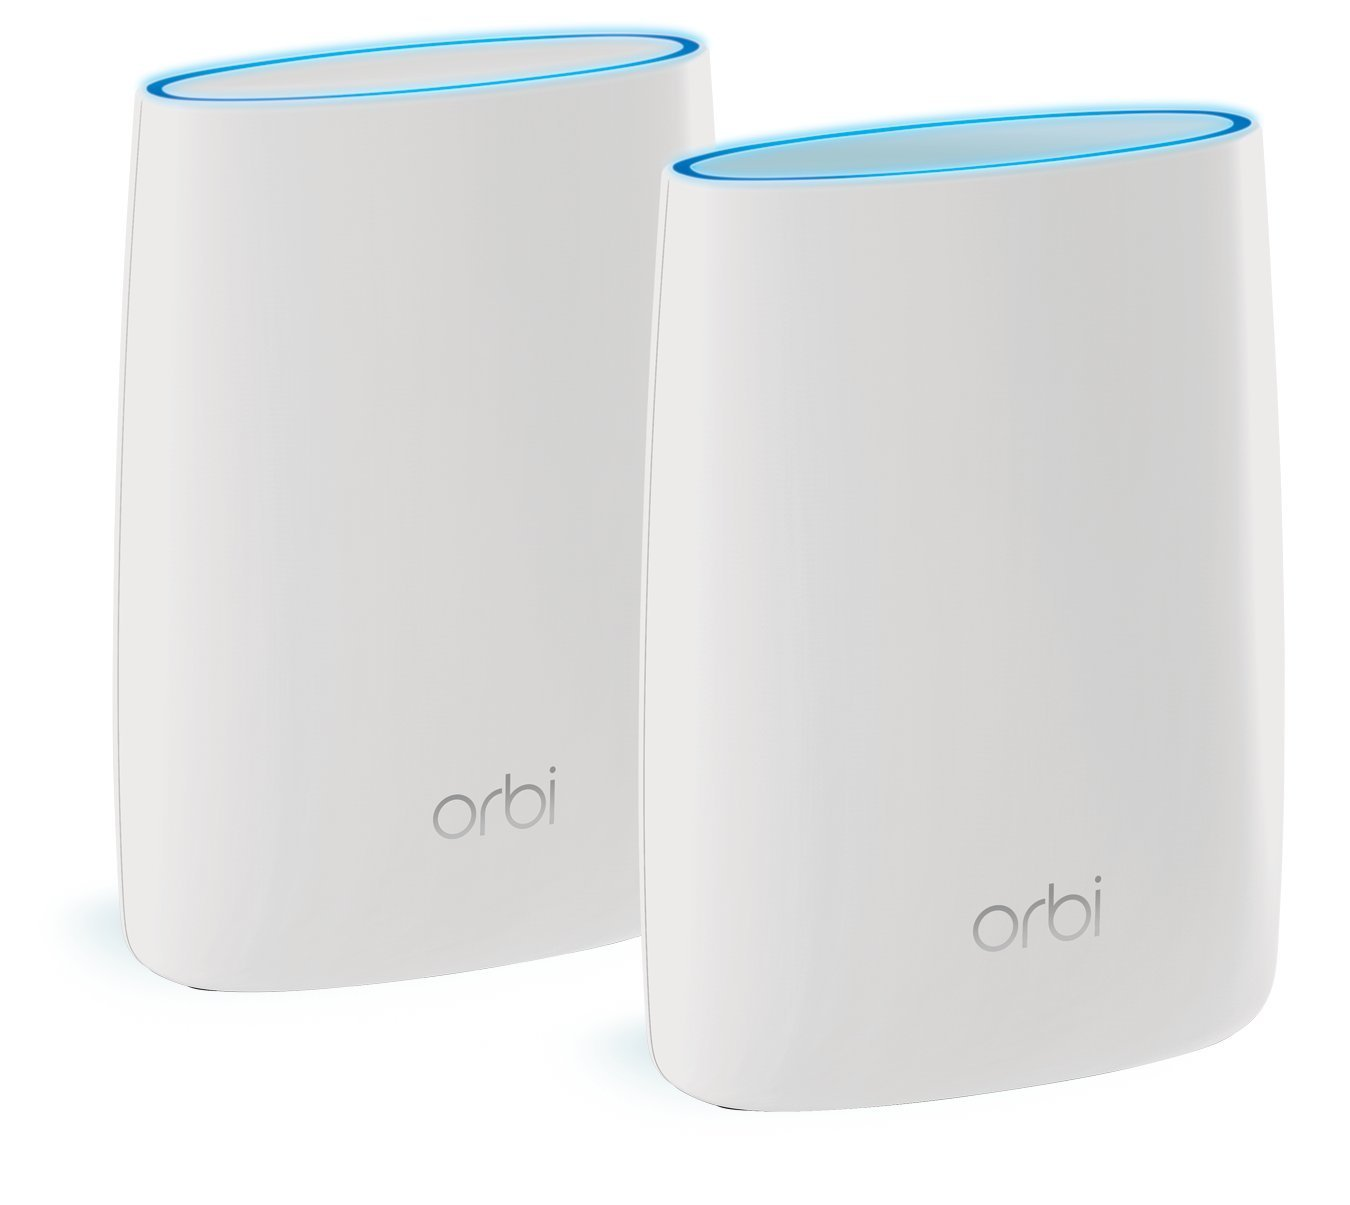 Review: Netgear Orbi AC3000 Tri-band Wifi System (RBK50)